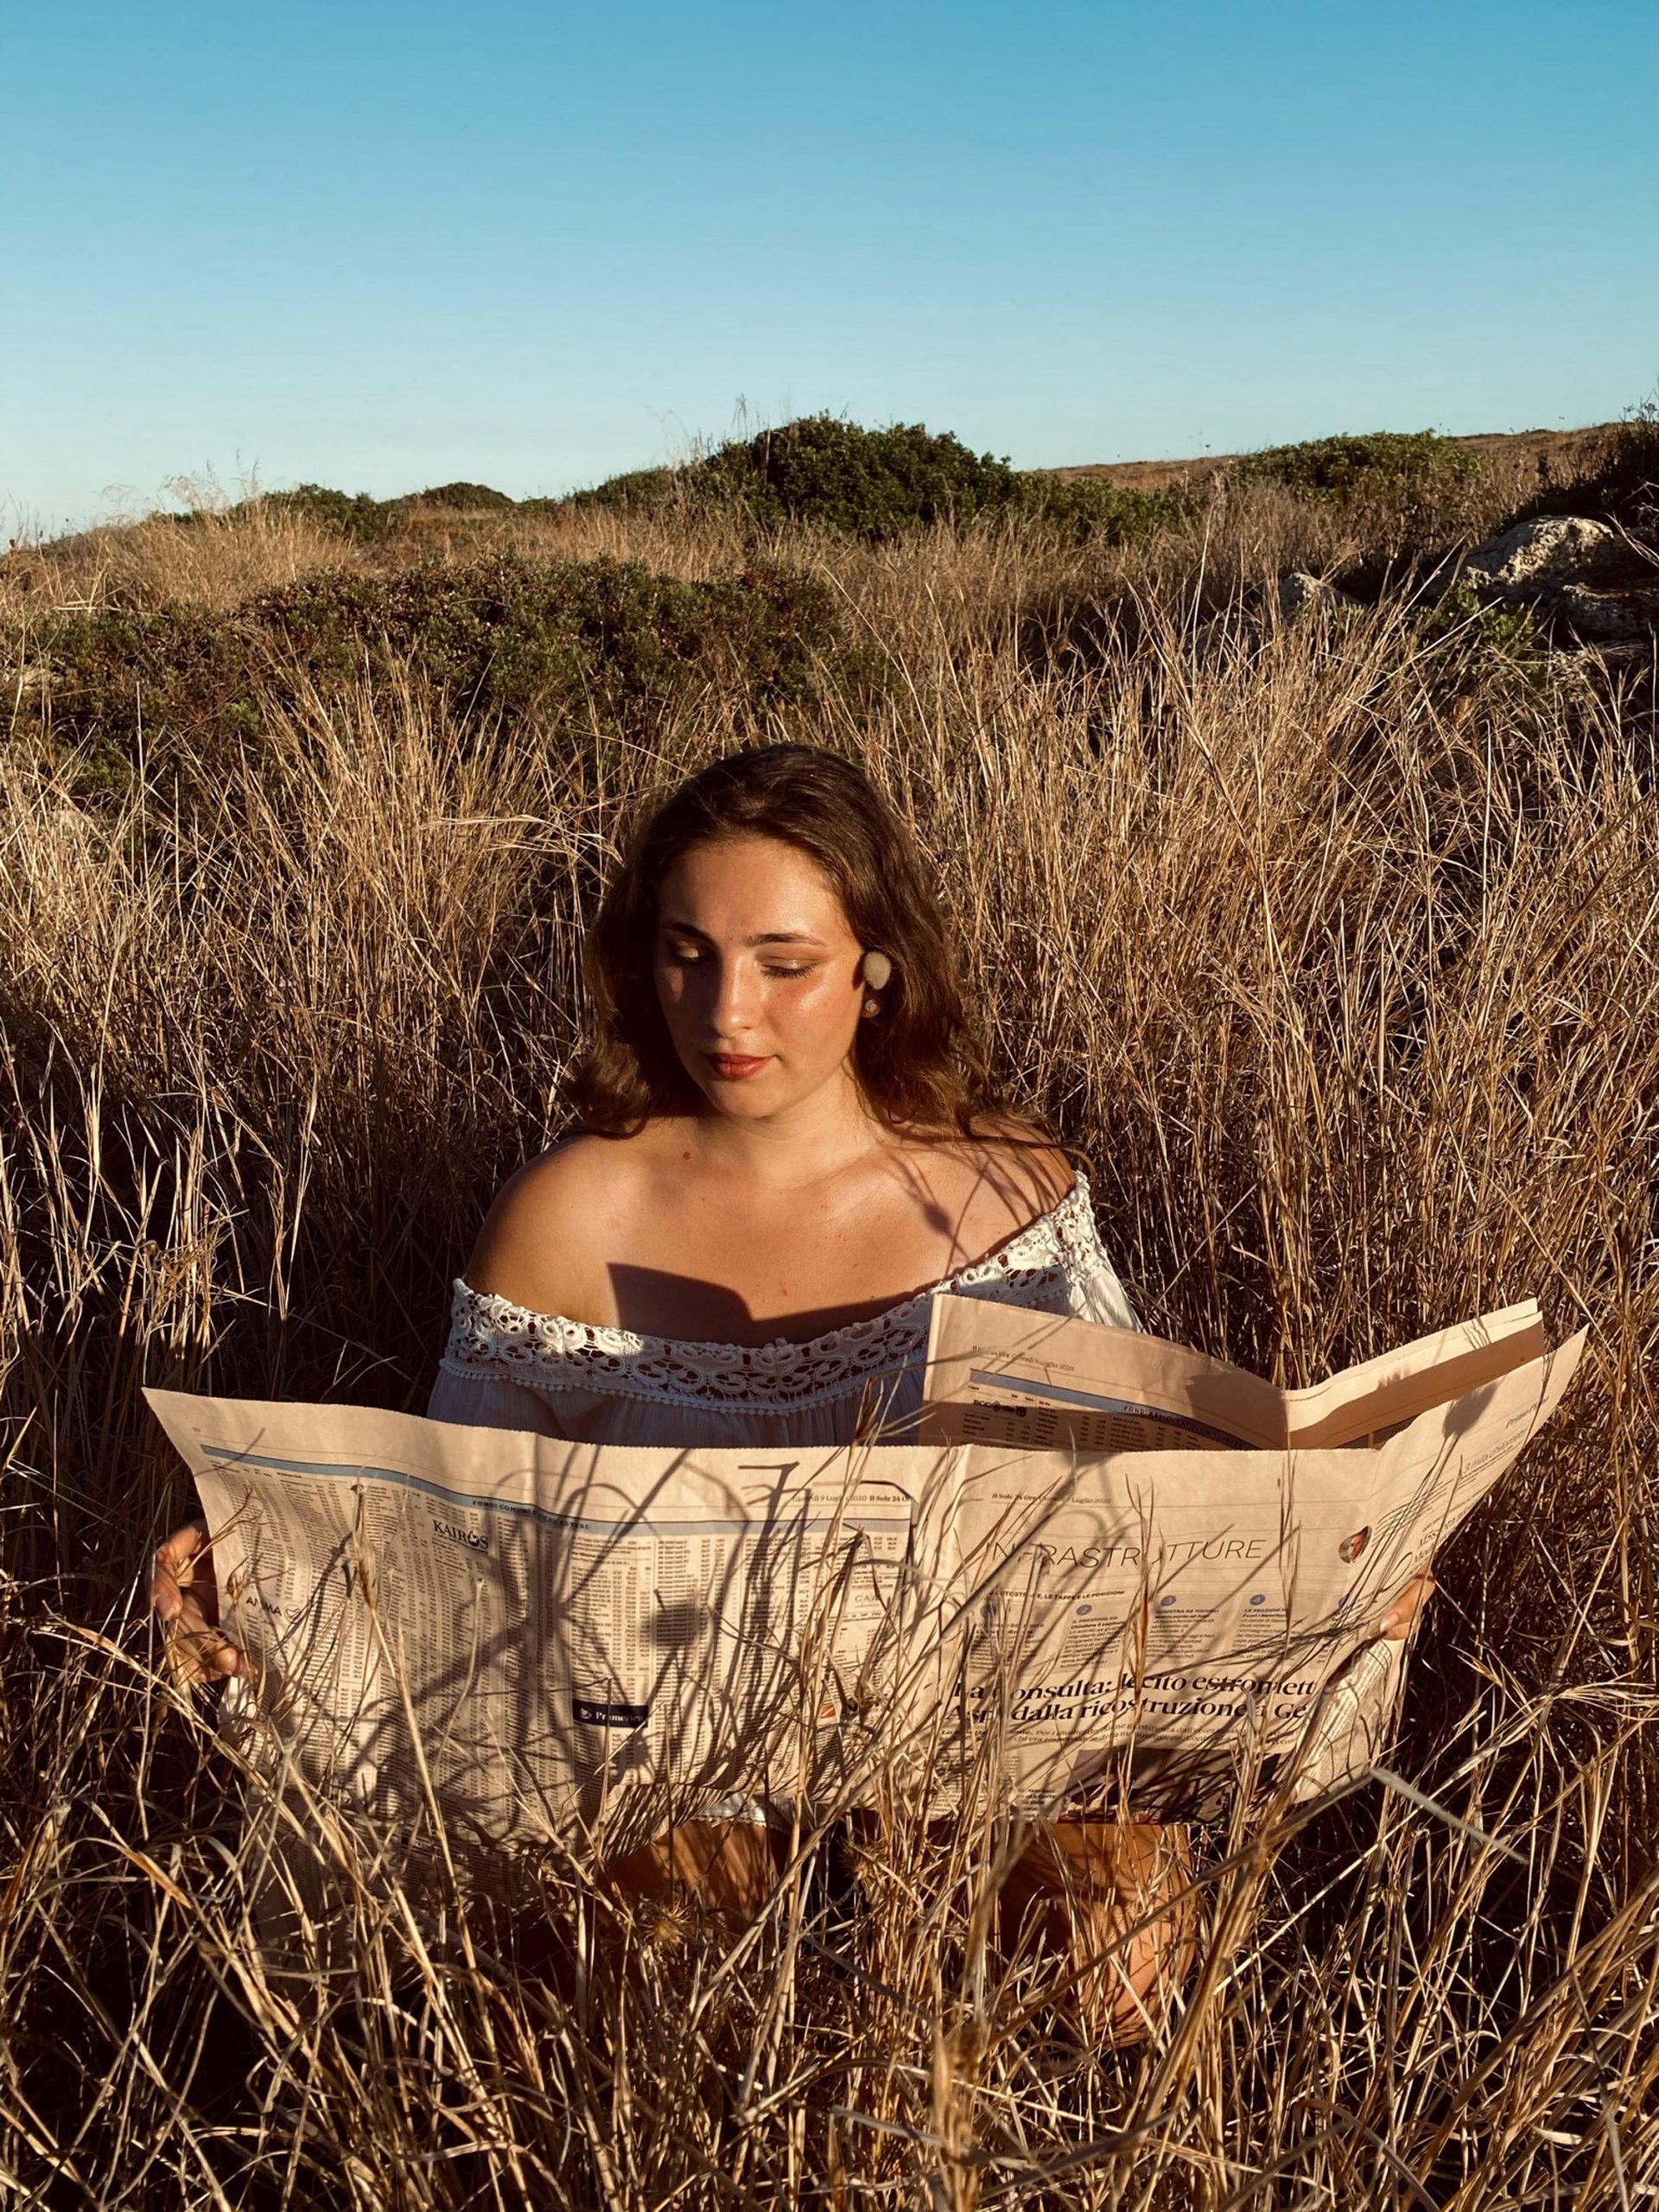 Categorie: Glamour, Portrait - Photographer: LARA LONZAR (zoomintophotos) - Model: GAIA DIMINA - Location: Siracusa, SR, Italia